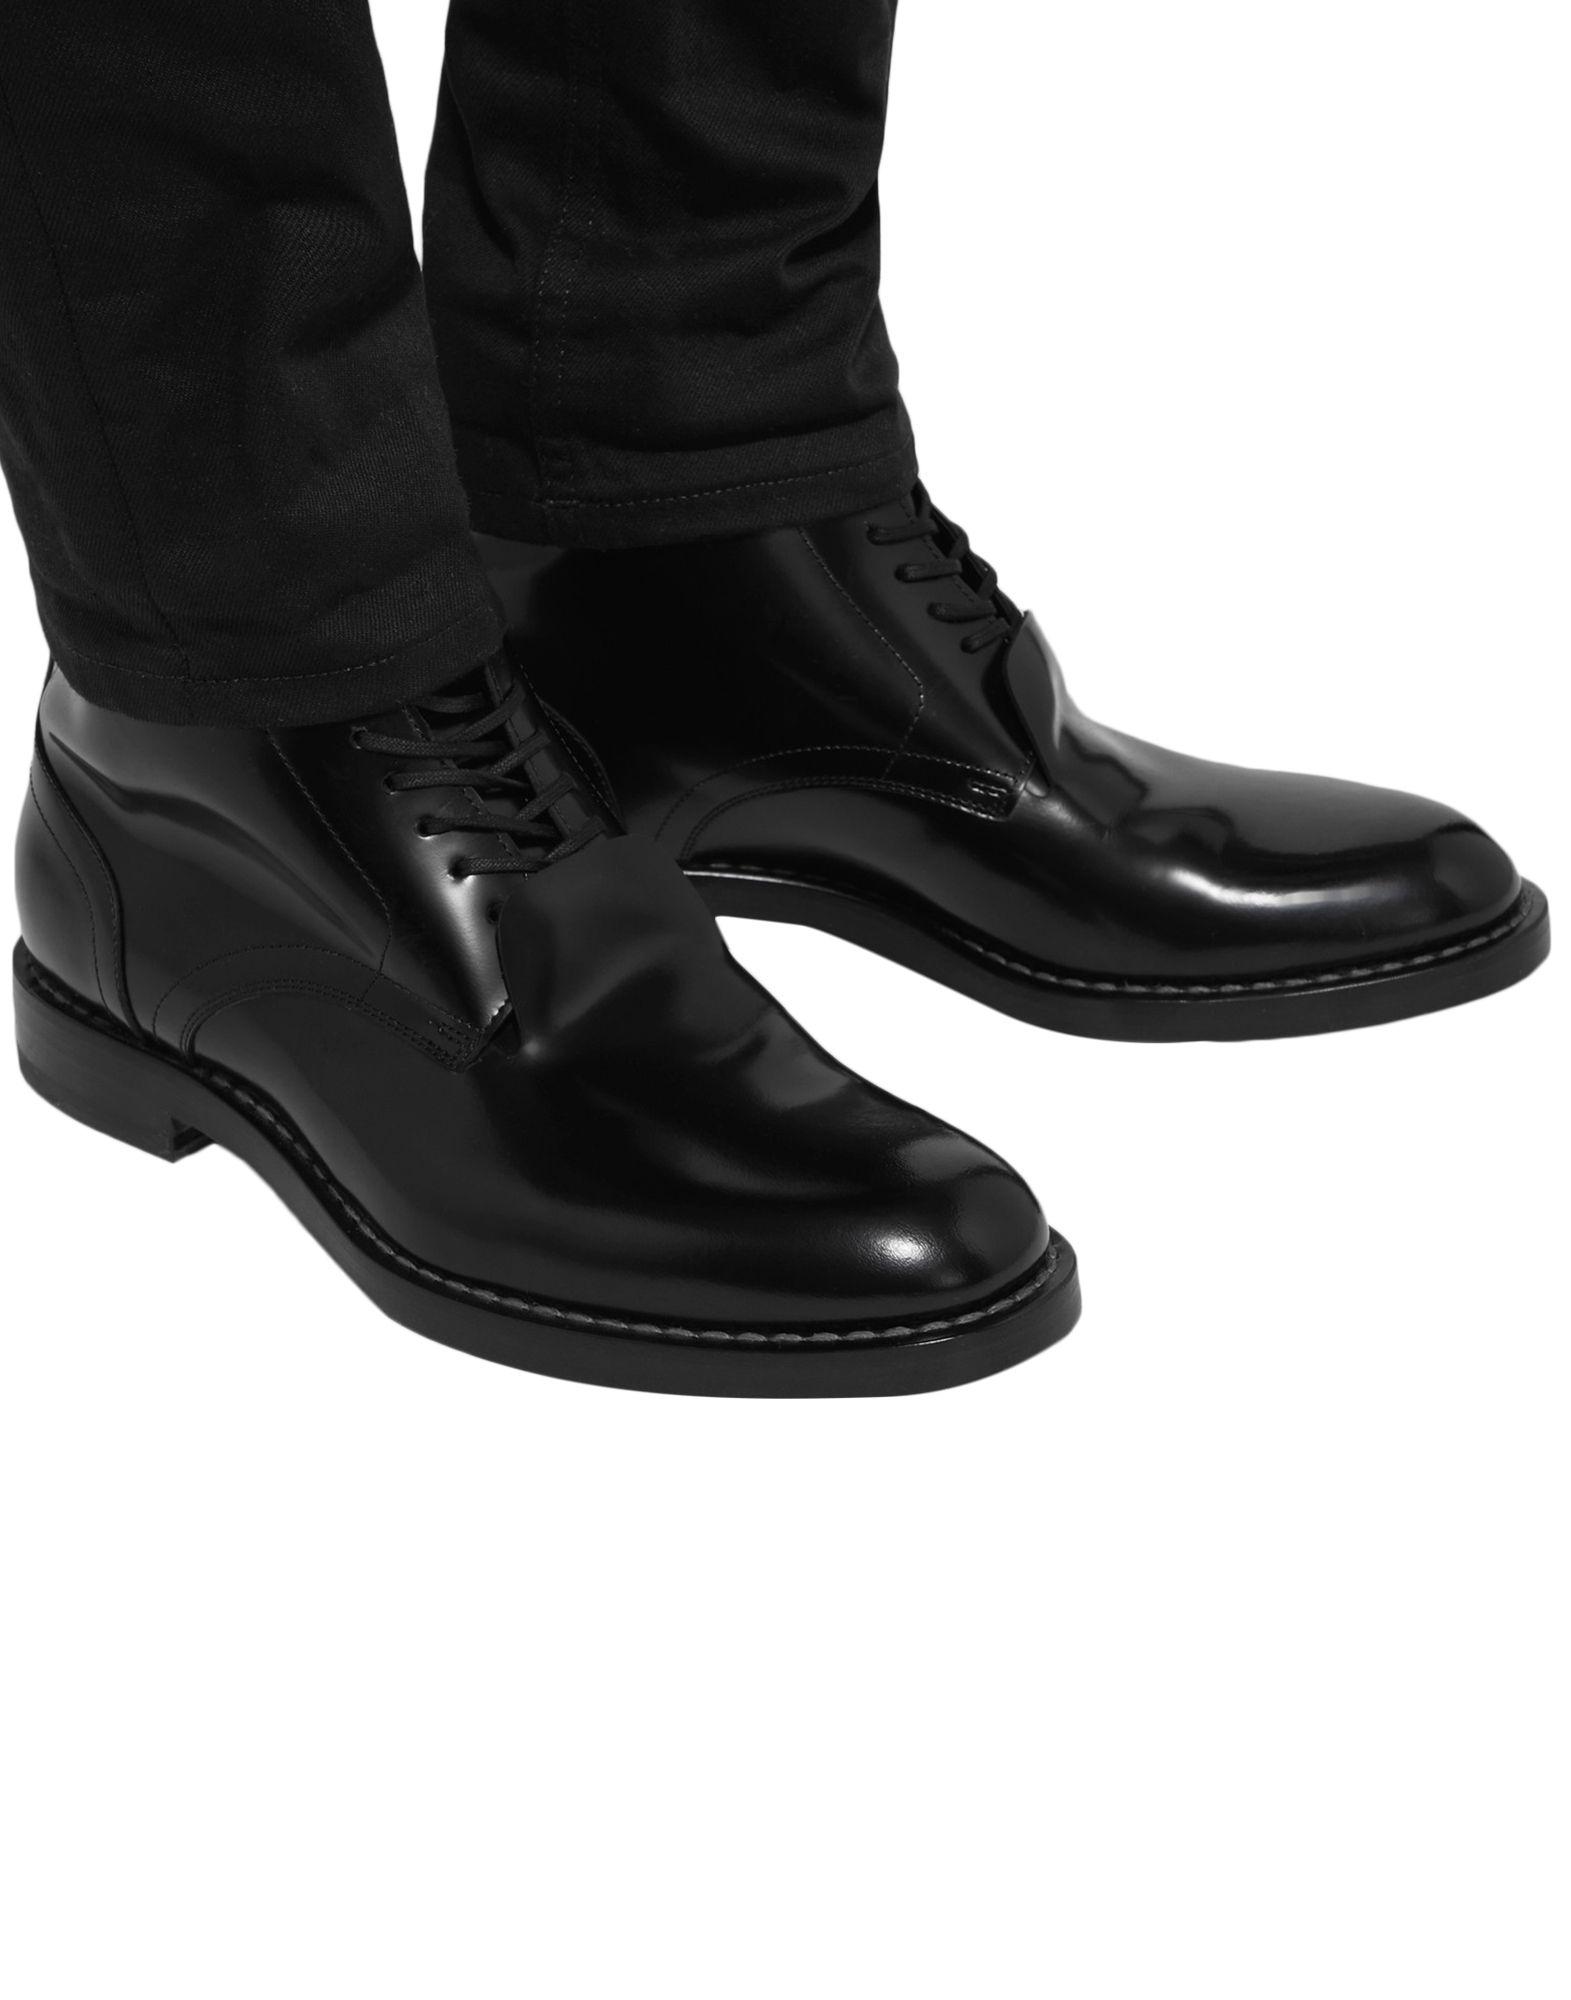 Maison Margiela Boots - Men Maison Margiela Boots online on 11540992WD  United Kingdom - 11540992WD on 8a630d